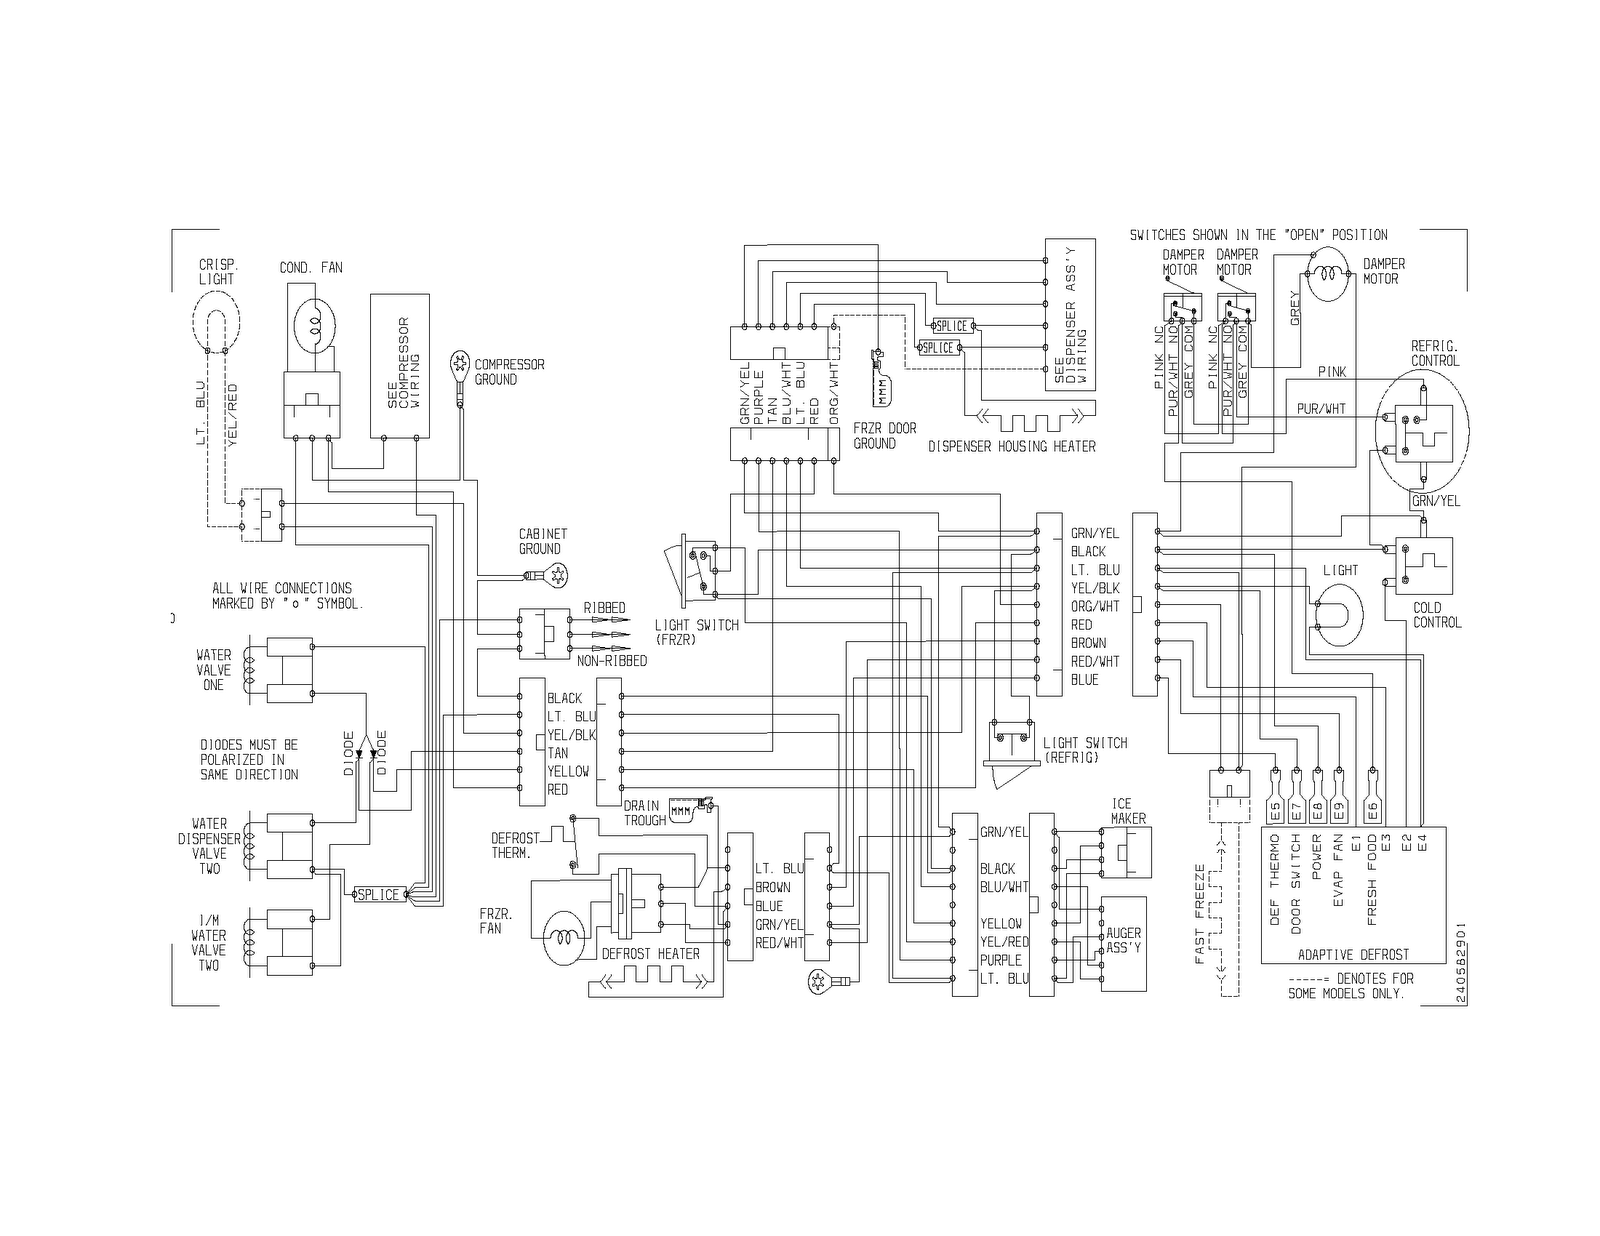 medium resolution of youtube whirlpool ice maker wiring diagram best wiring librarywhirlpool ice maker parts diagram solenoid whirlpool ice